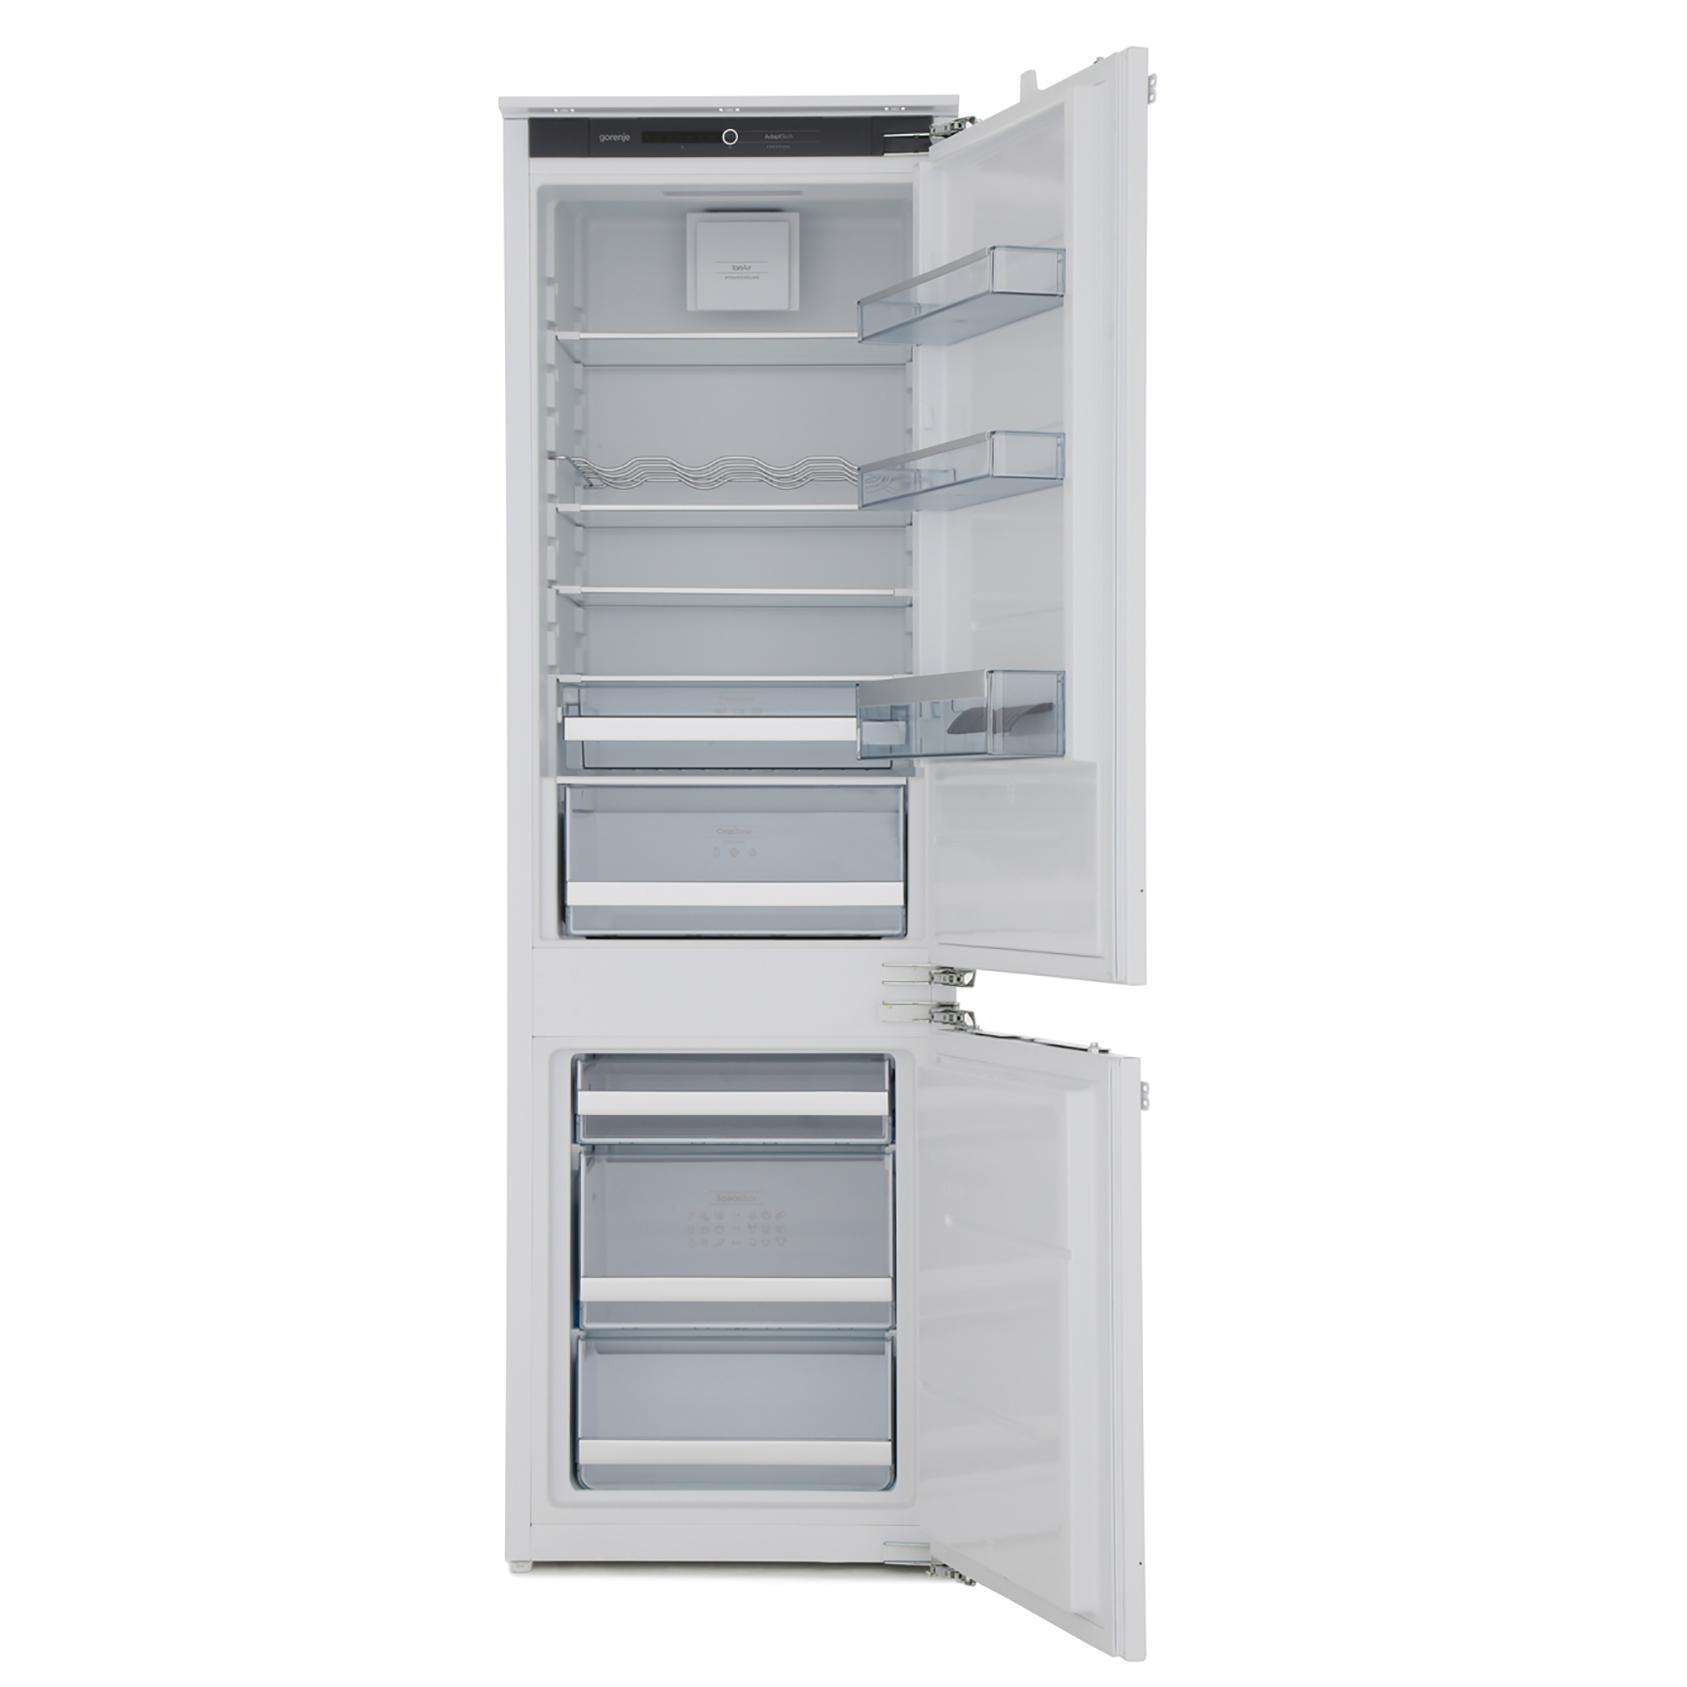 Gorenje RKI5182A1UK Frost Free Integrated Fridge Freezer